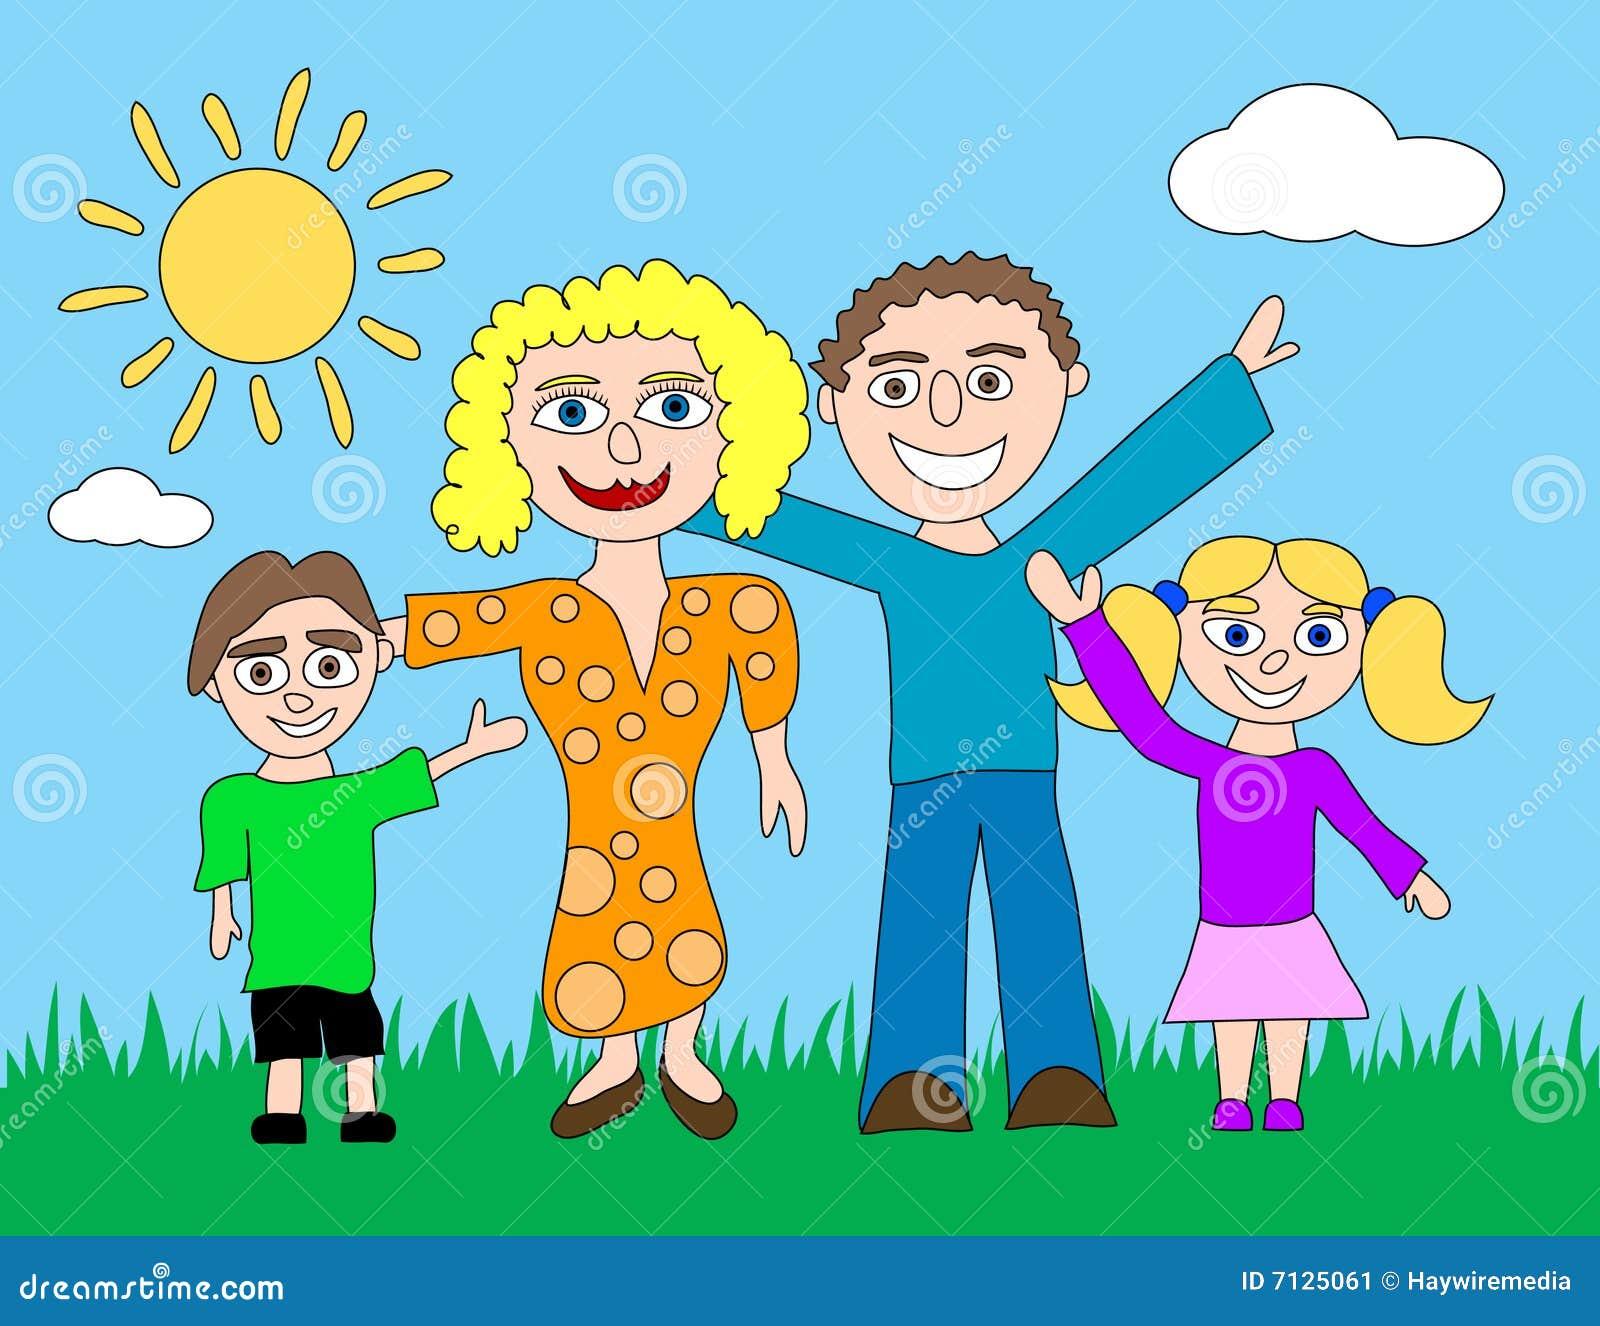 fam u00edlia feliz dos desenhos animados ilustra u00e7 u00e3o do vetor helping others clipart helping others clip art black and white